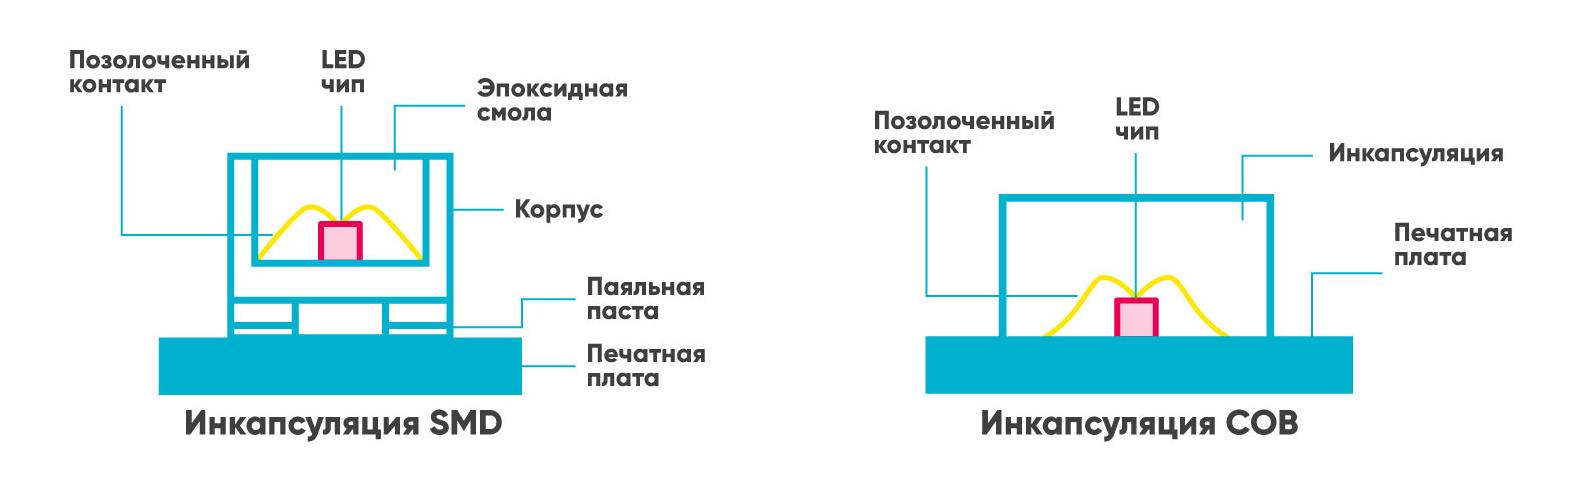 Технологии производства светодиодных LED экранов: Micro-LED vs. Mini-LED — IT-МИР. ПОМОЩЬ В IT-МИРЕ 2021